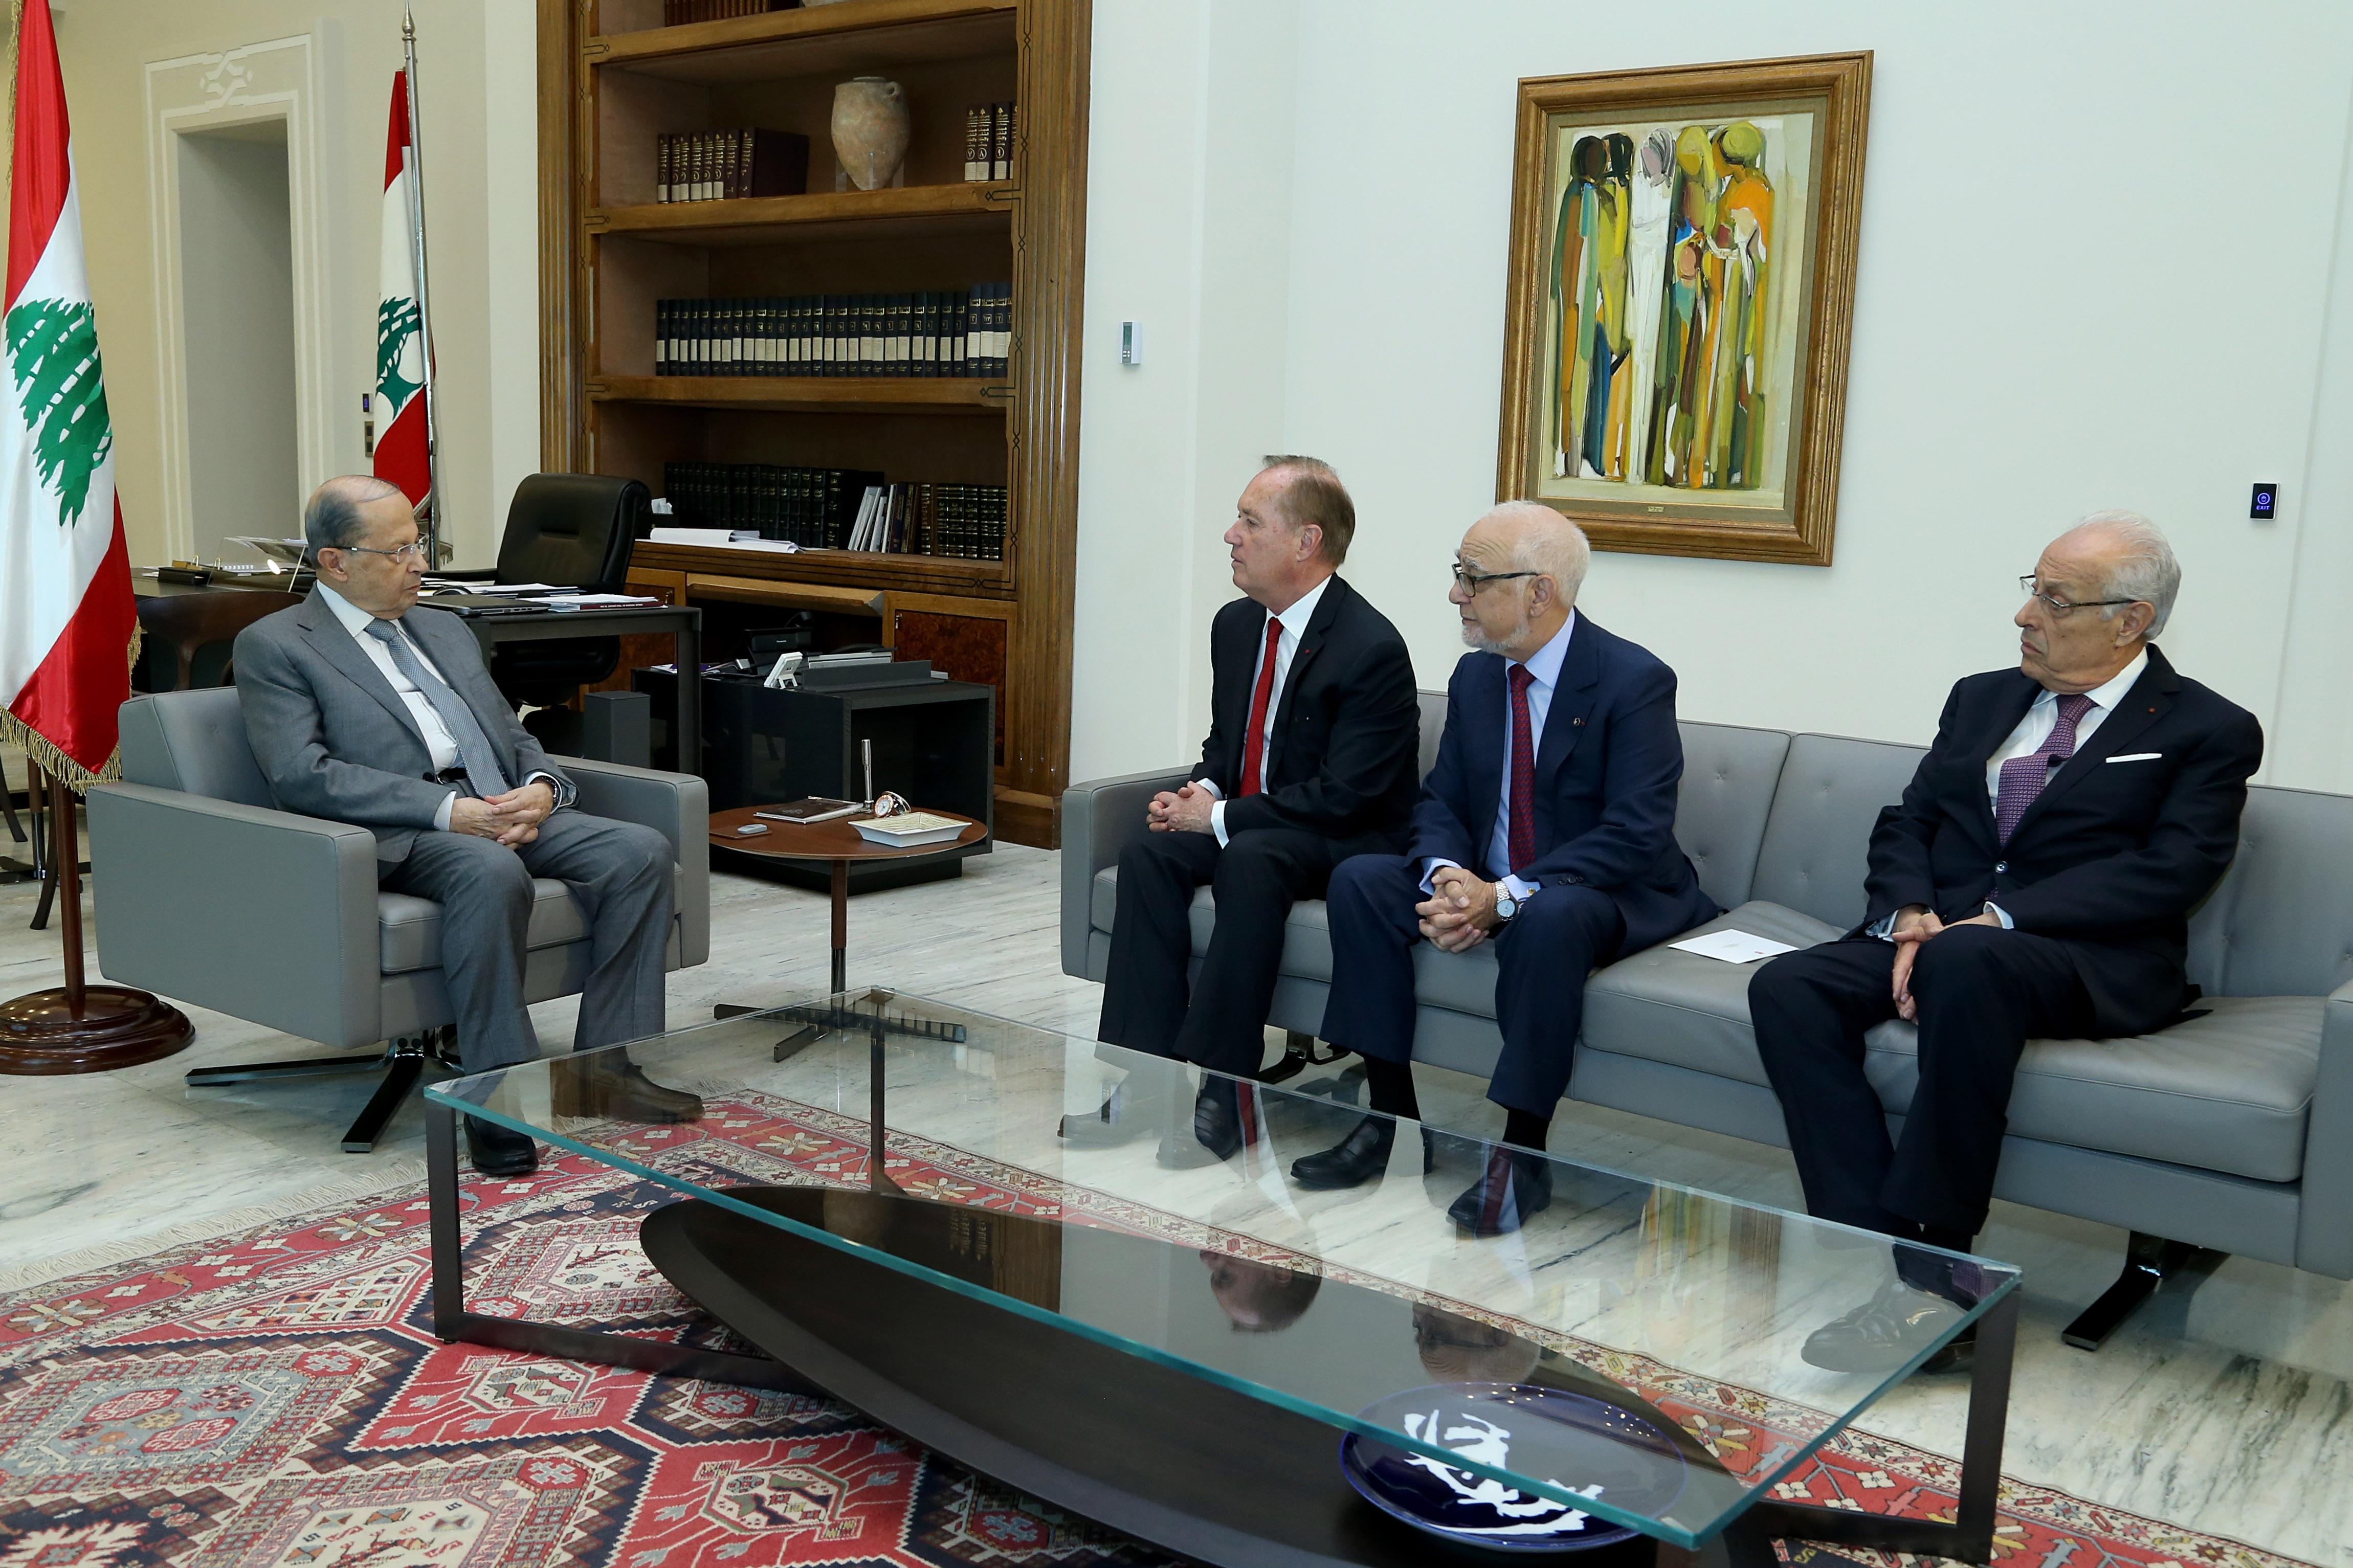 02 - Mr. Bertrand Besancenot with a delegation (1)